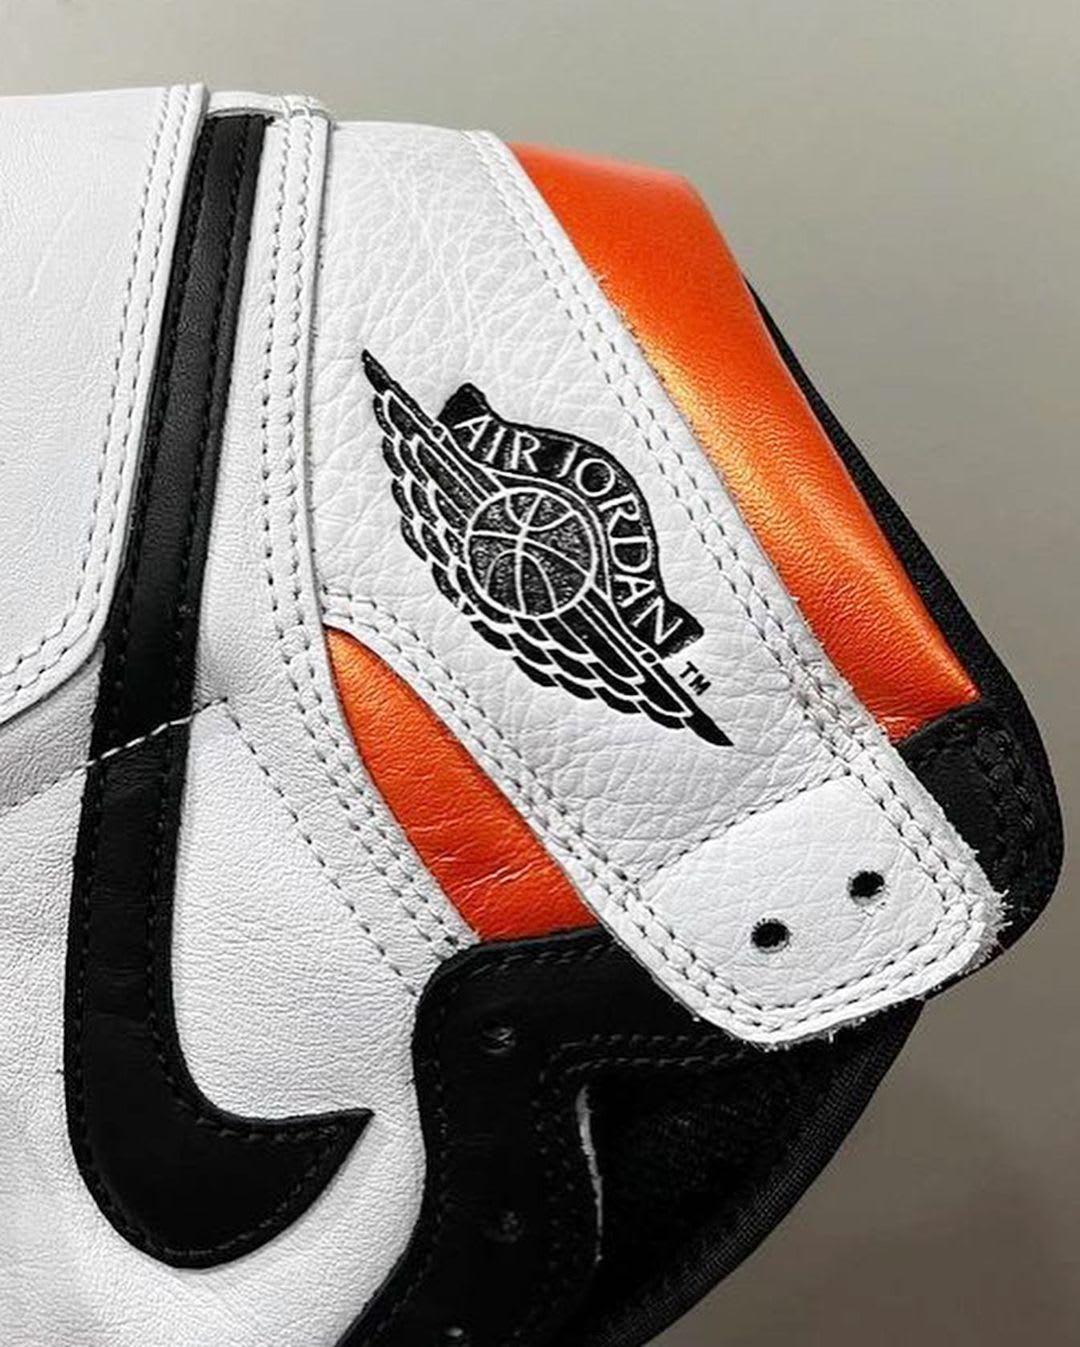 Air Jordan 1 Retro High OG 'Electro Orange' 555088-180 Side